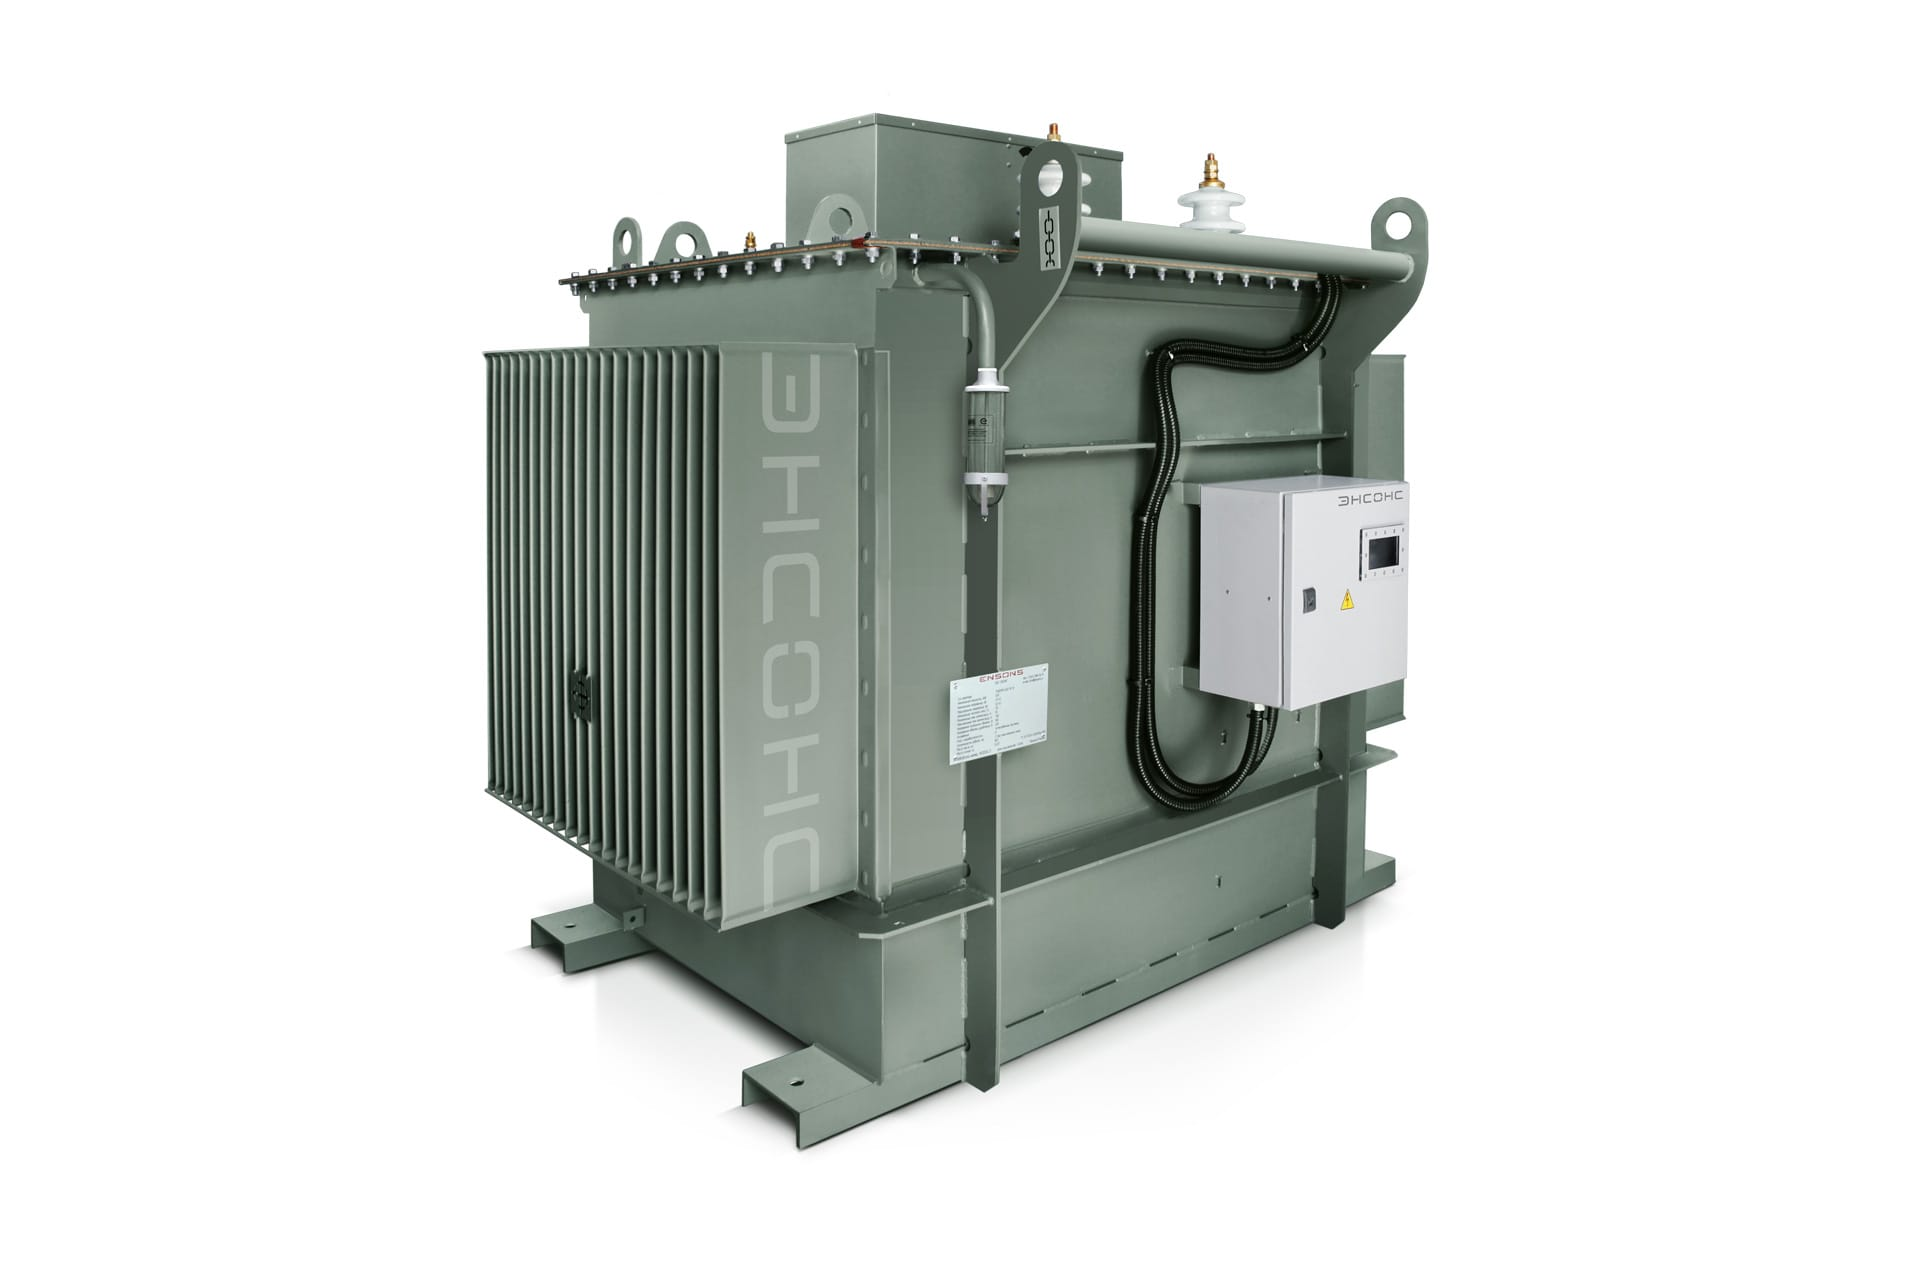 Ensons - Общий вид дугогасящего реактора РЗДПОМ 2000 кВА